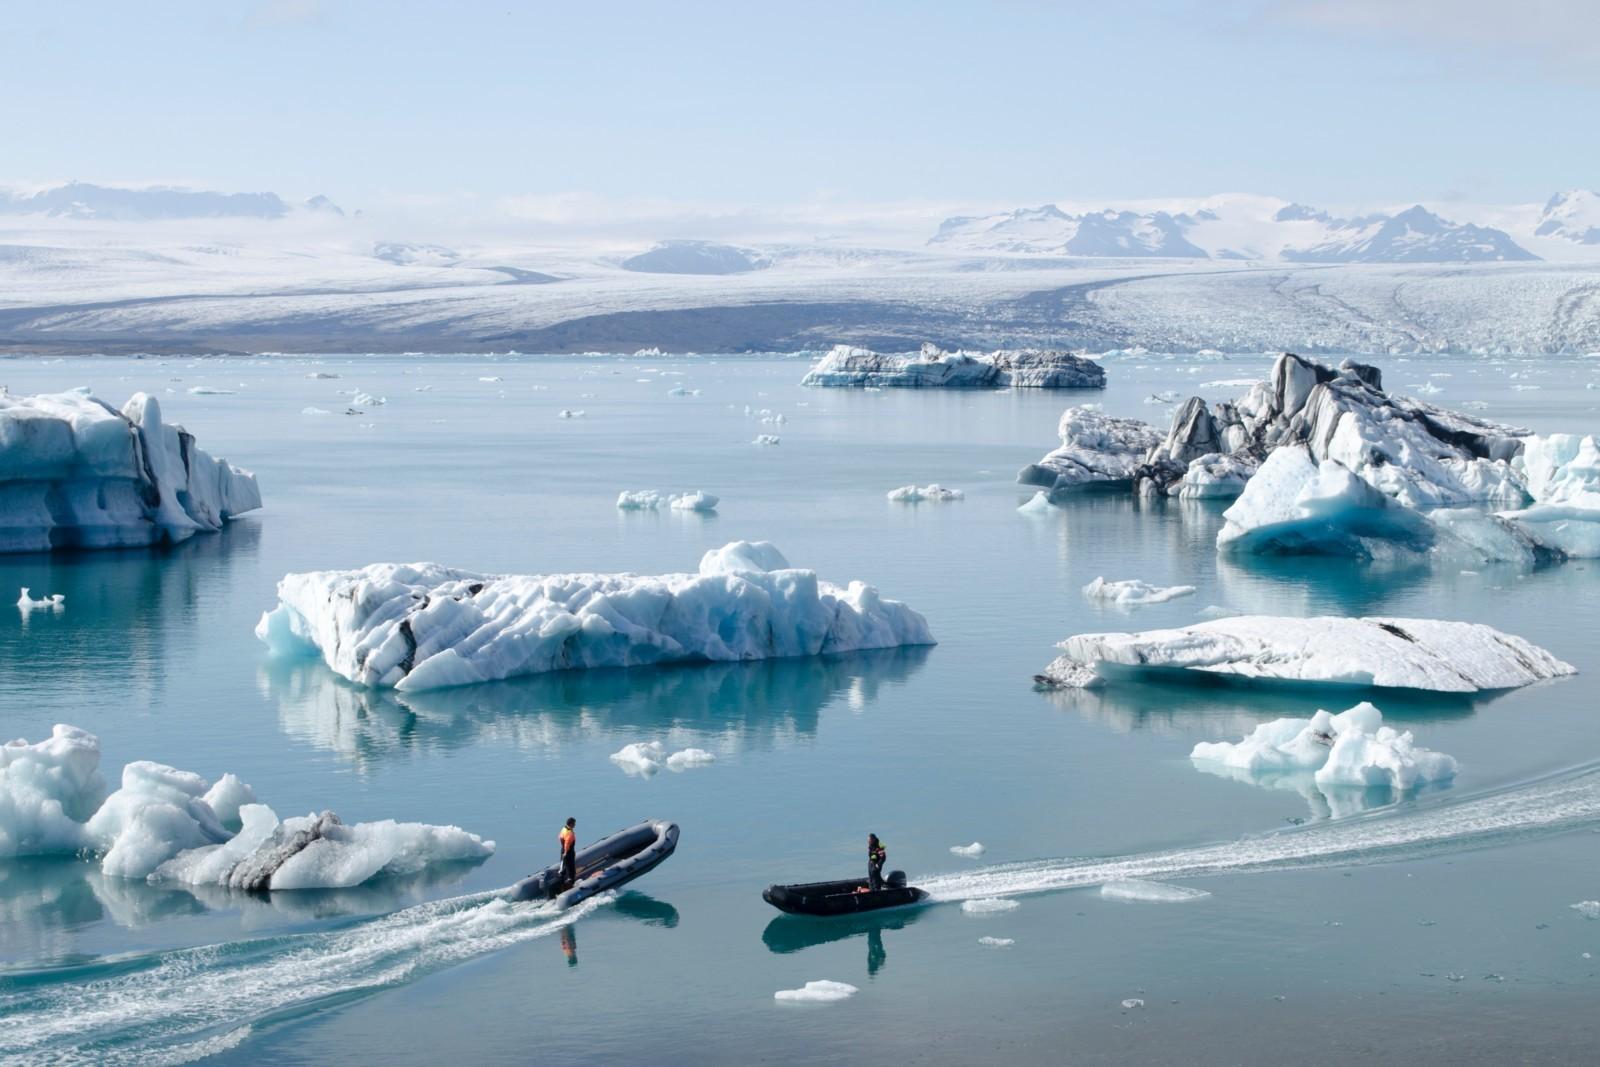 Хайтек для Арктики